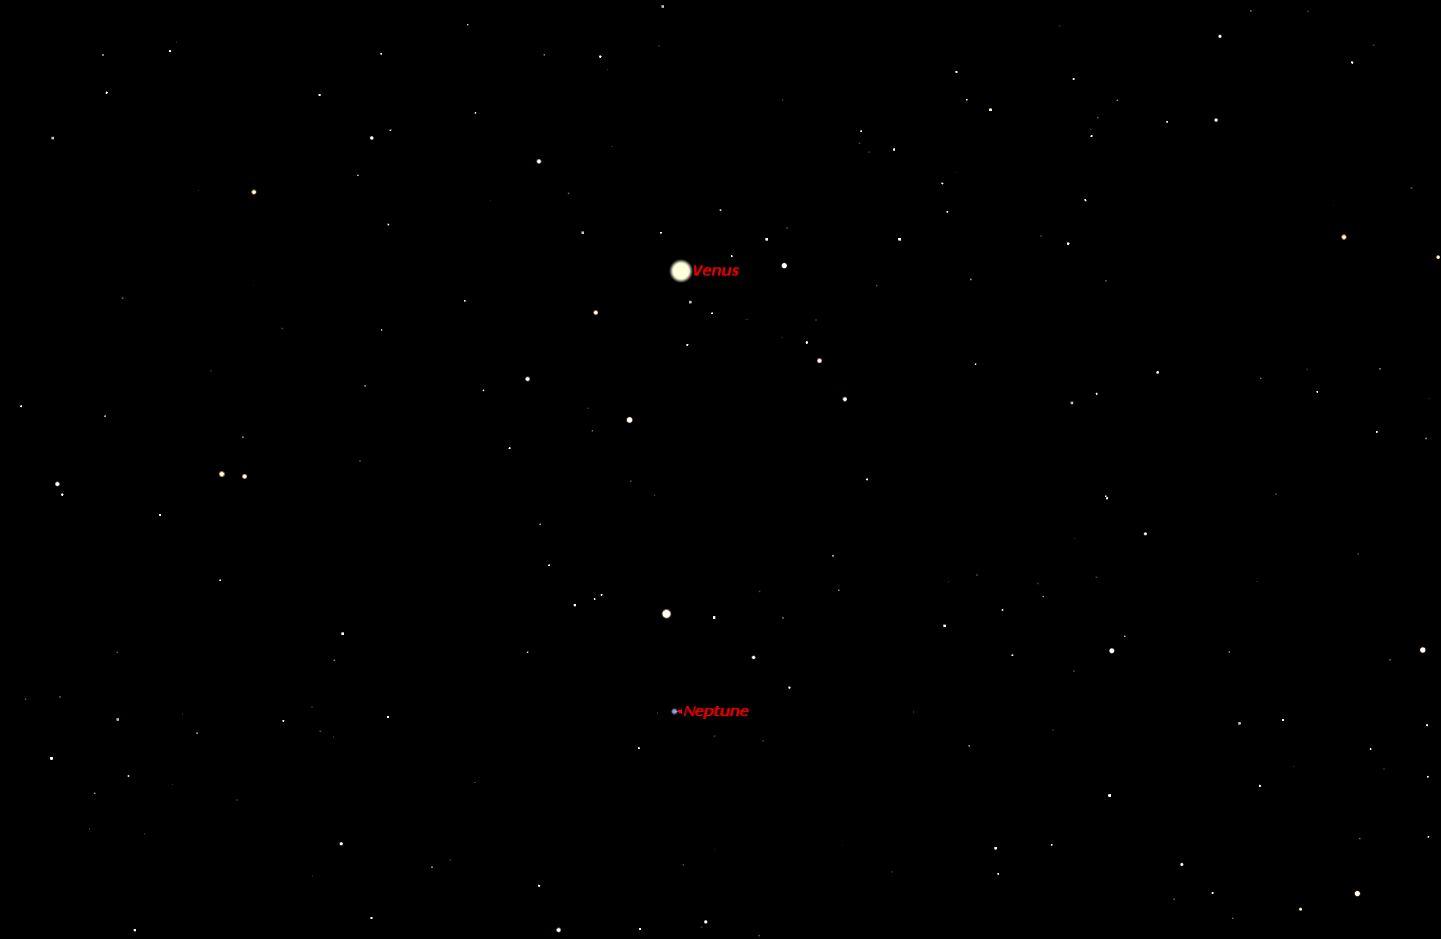 Venus and Neptune, April 2014